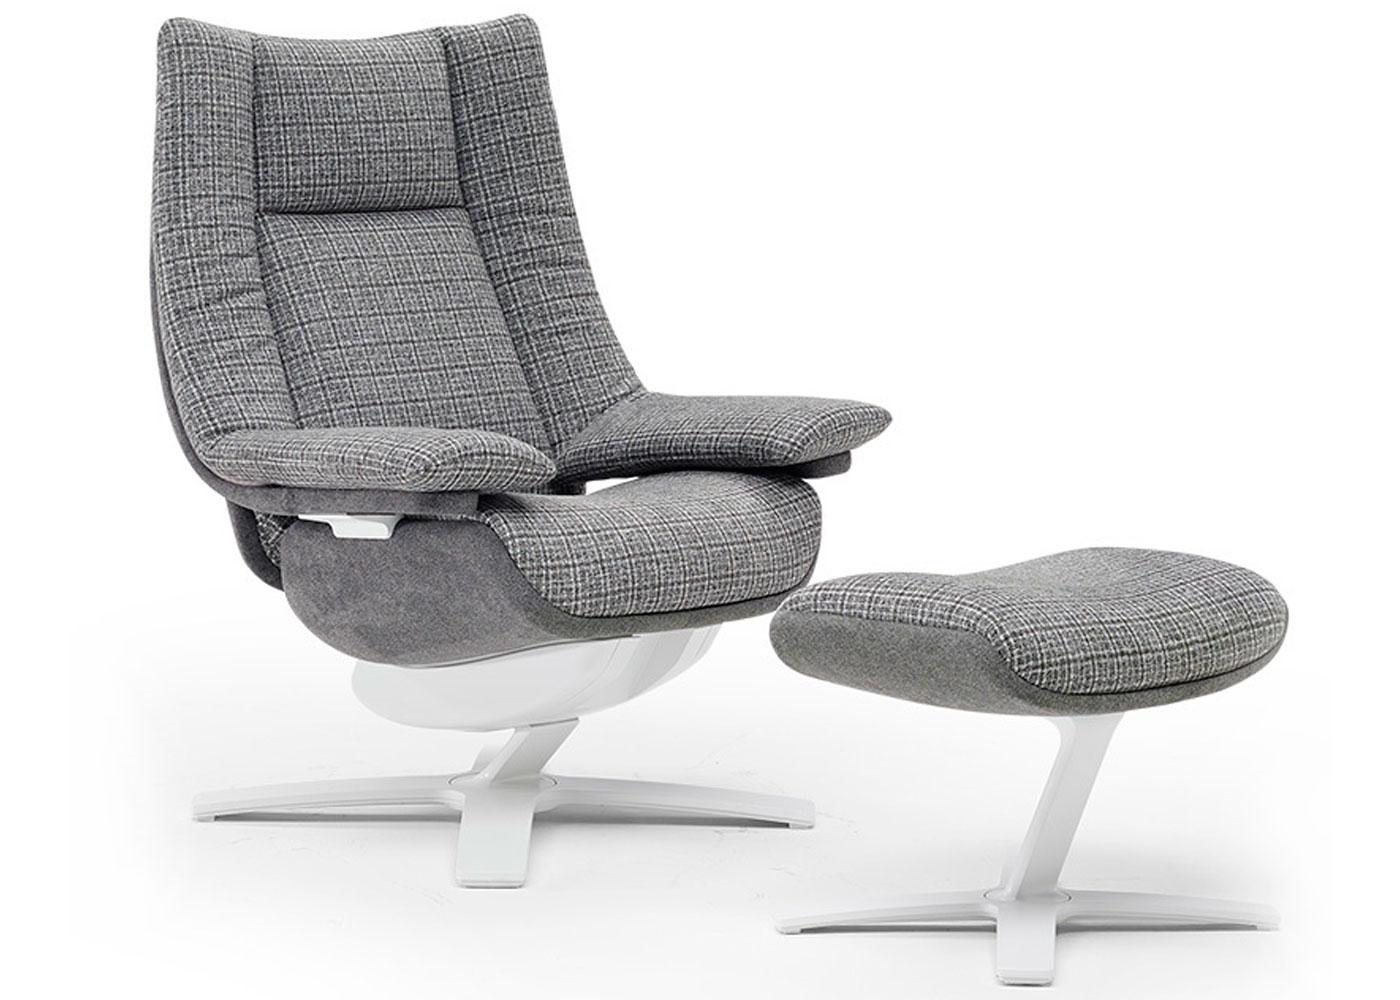 natuzzi revive chair desk knobs re vive suit midfurn furniture superstore